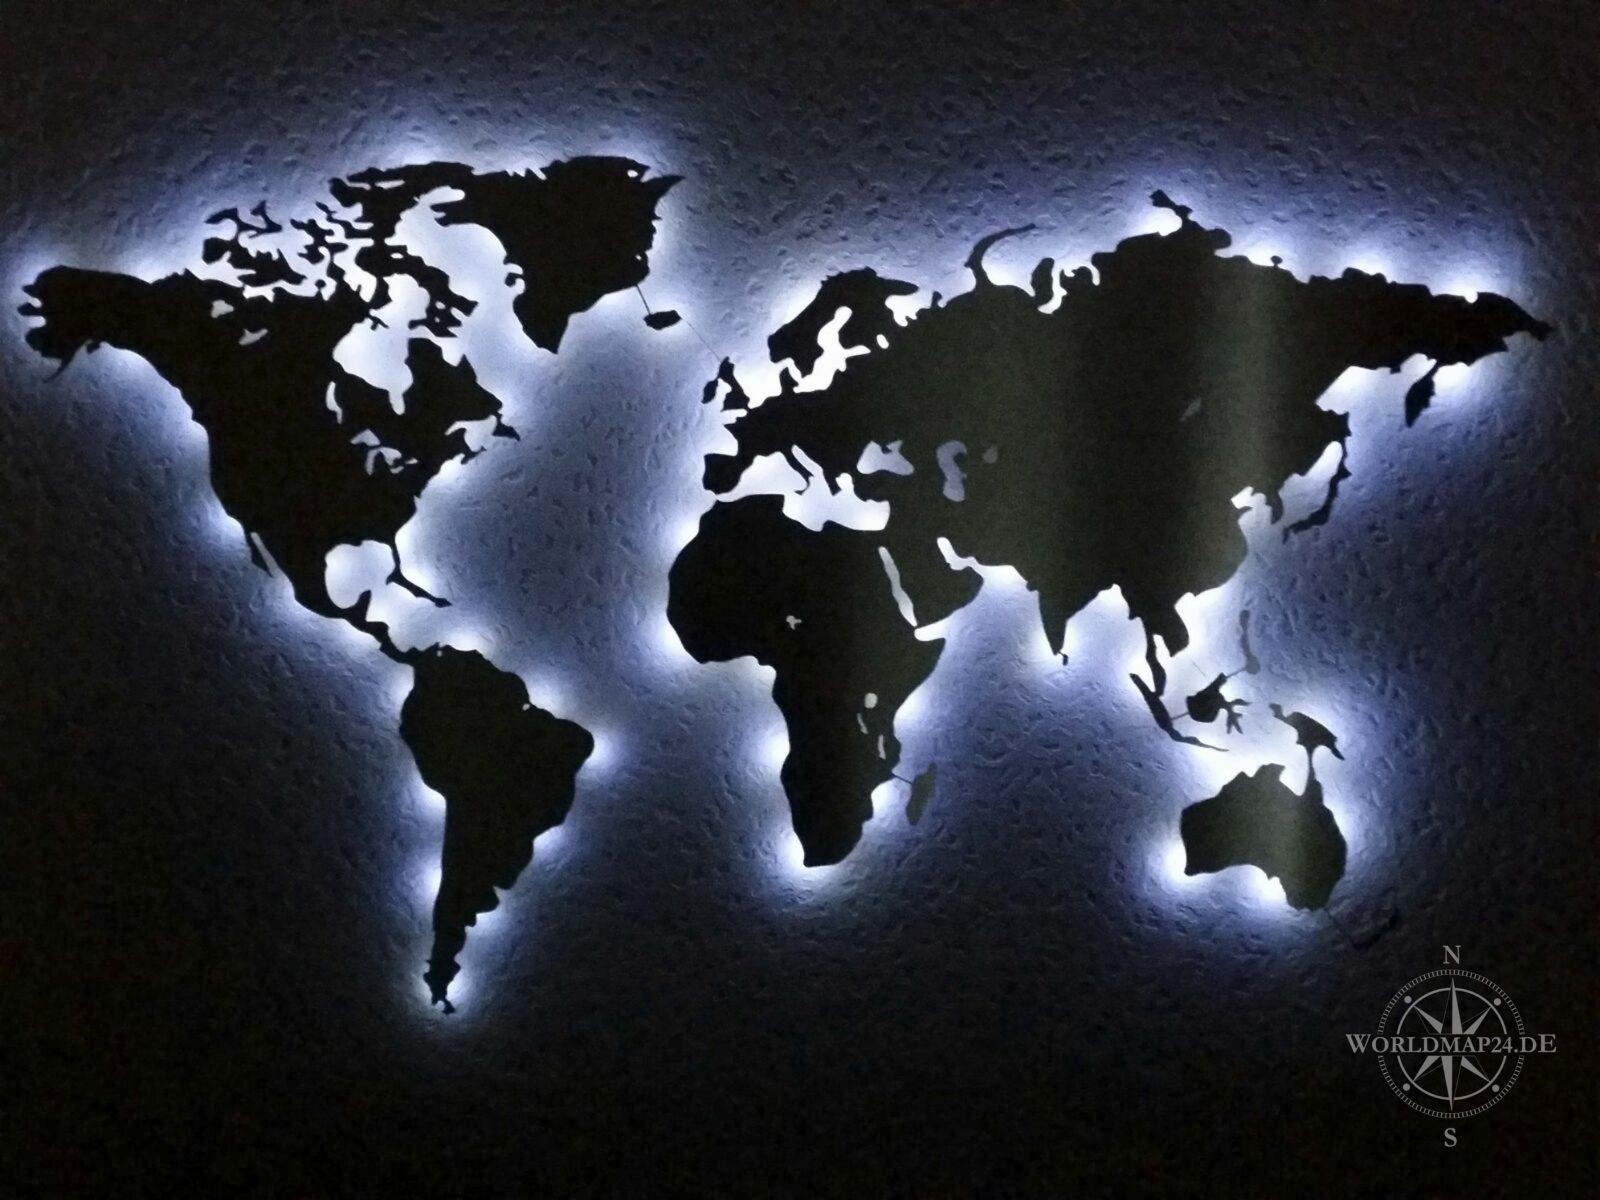 Beleuchtete Weltkarte Wand Dekoration Aus Edelstahl Rbg Led Diy von Led Leinwandbild Selber Machen Photo